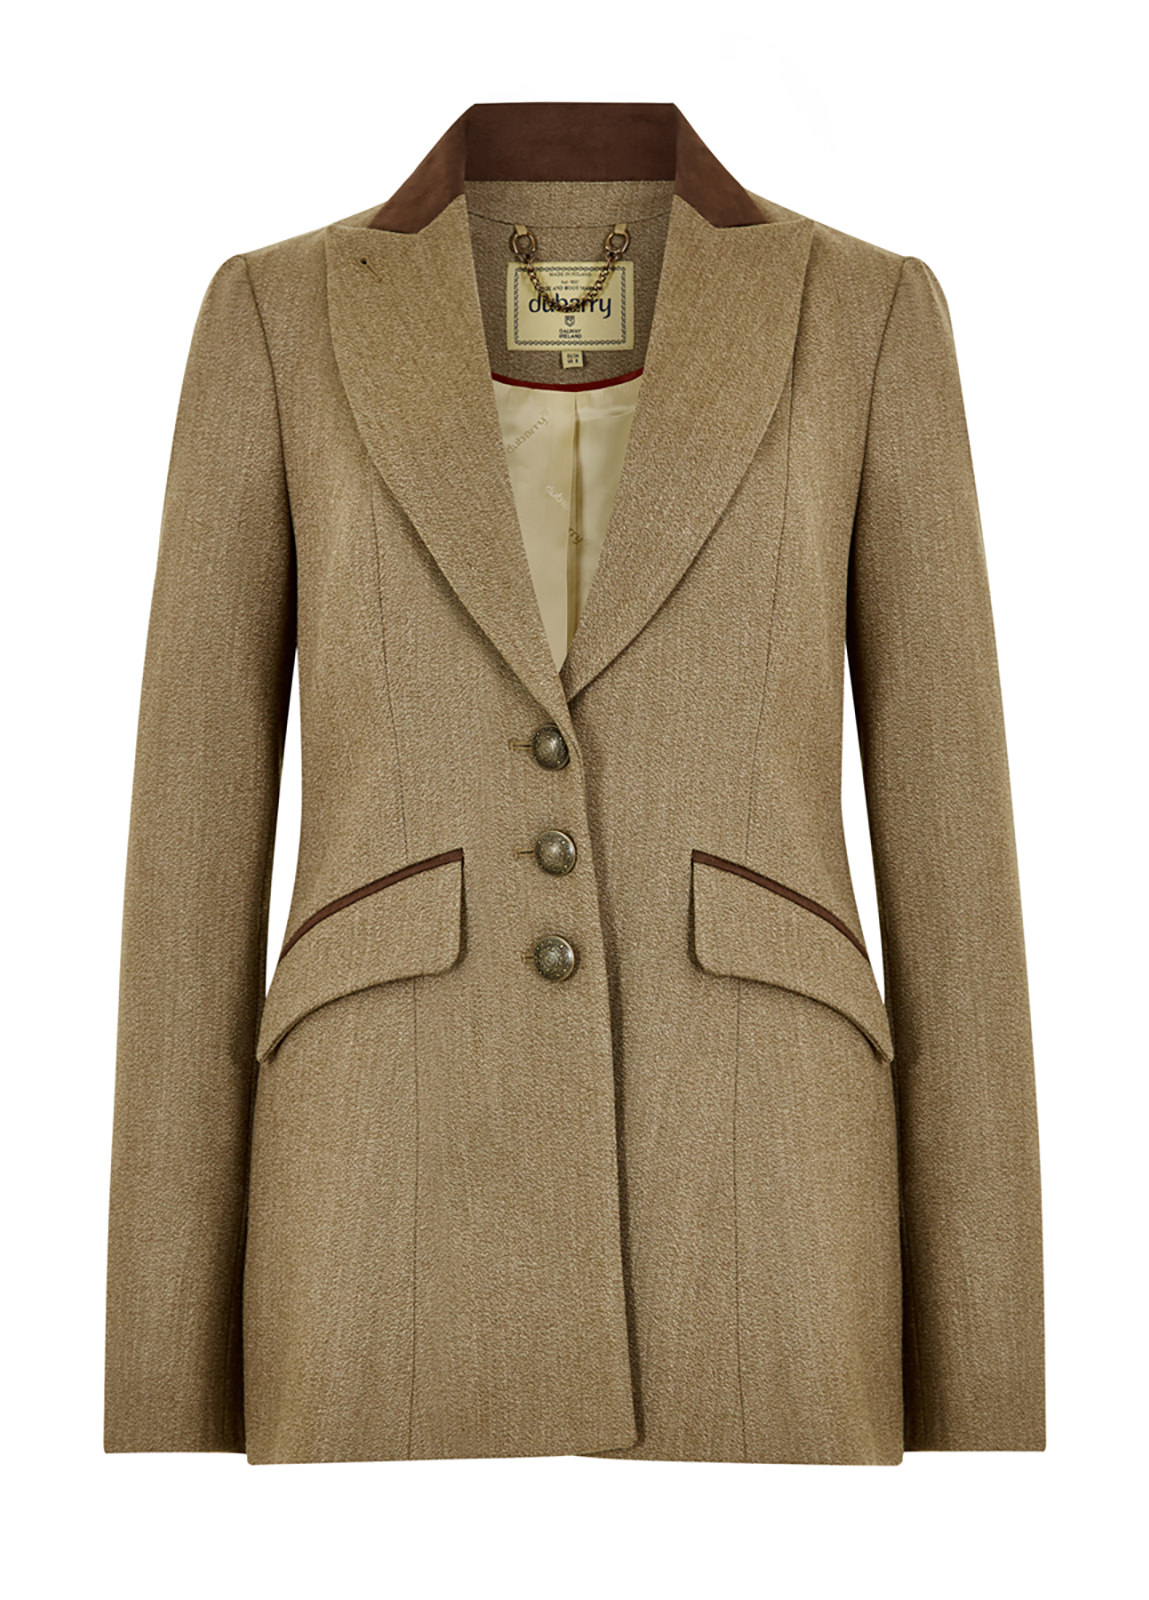 Dubarry_Heather Tweed Jacket - Pine_Image_2